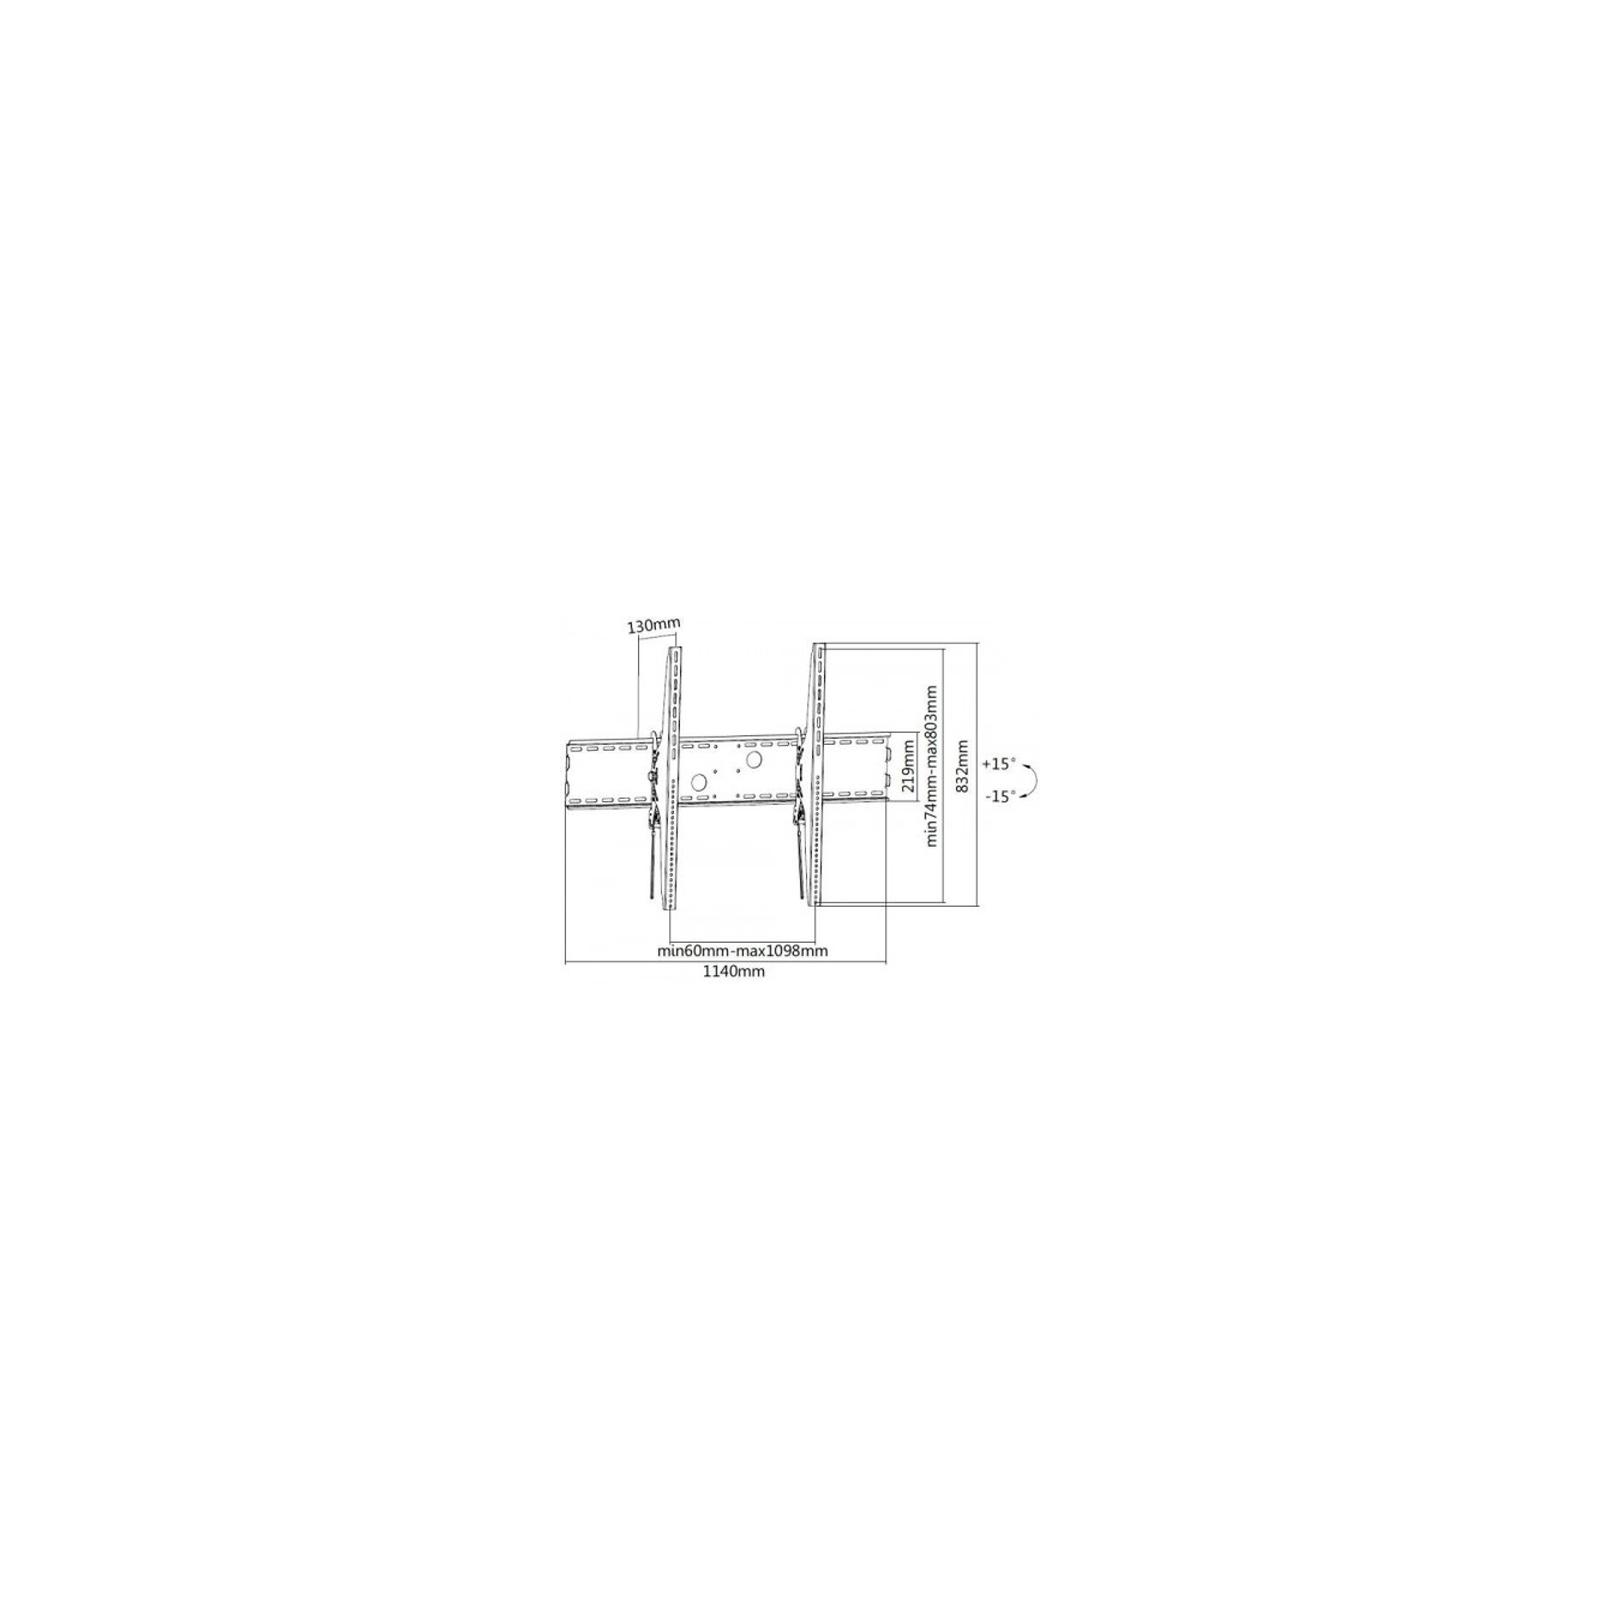 Кронштейн ITech PLB-120 изображение 2